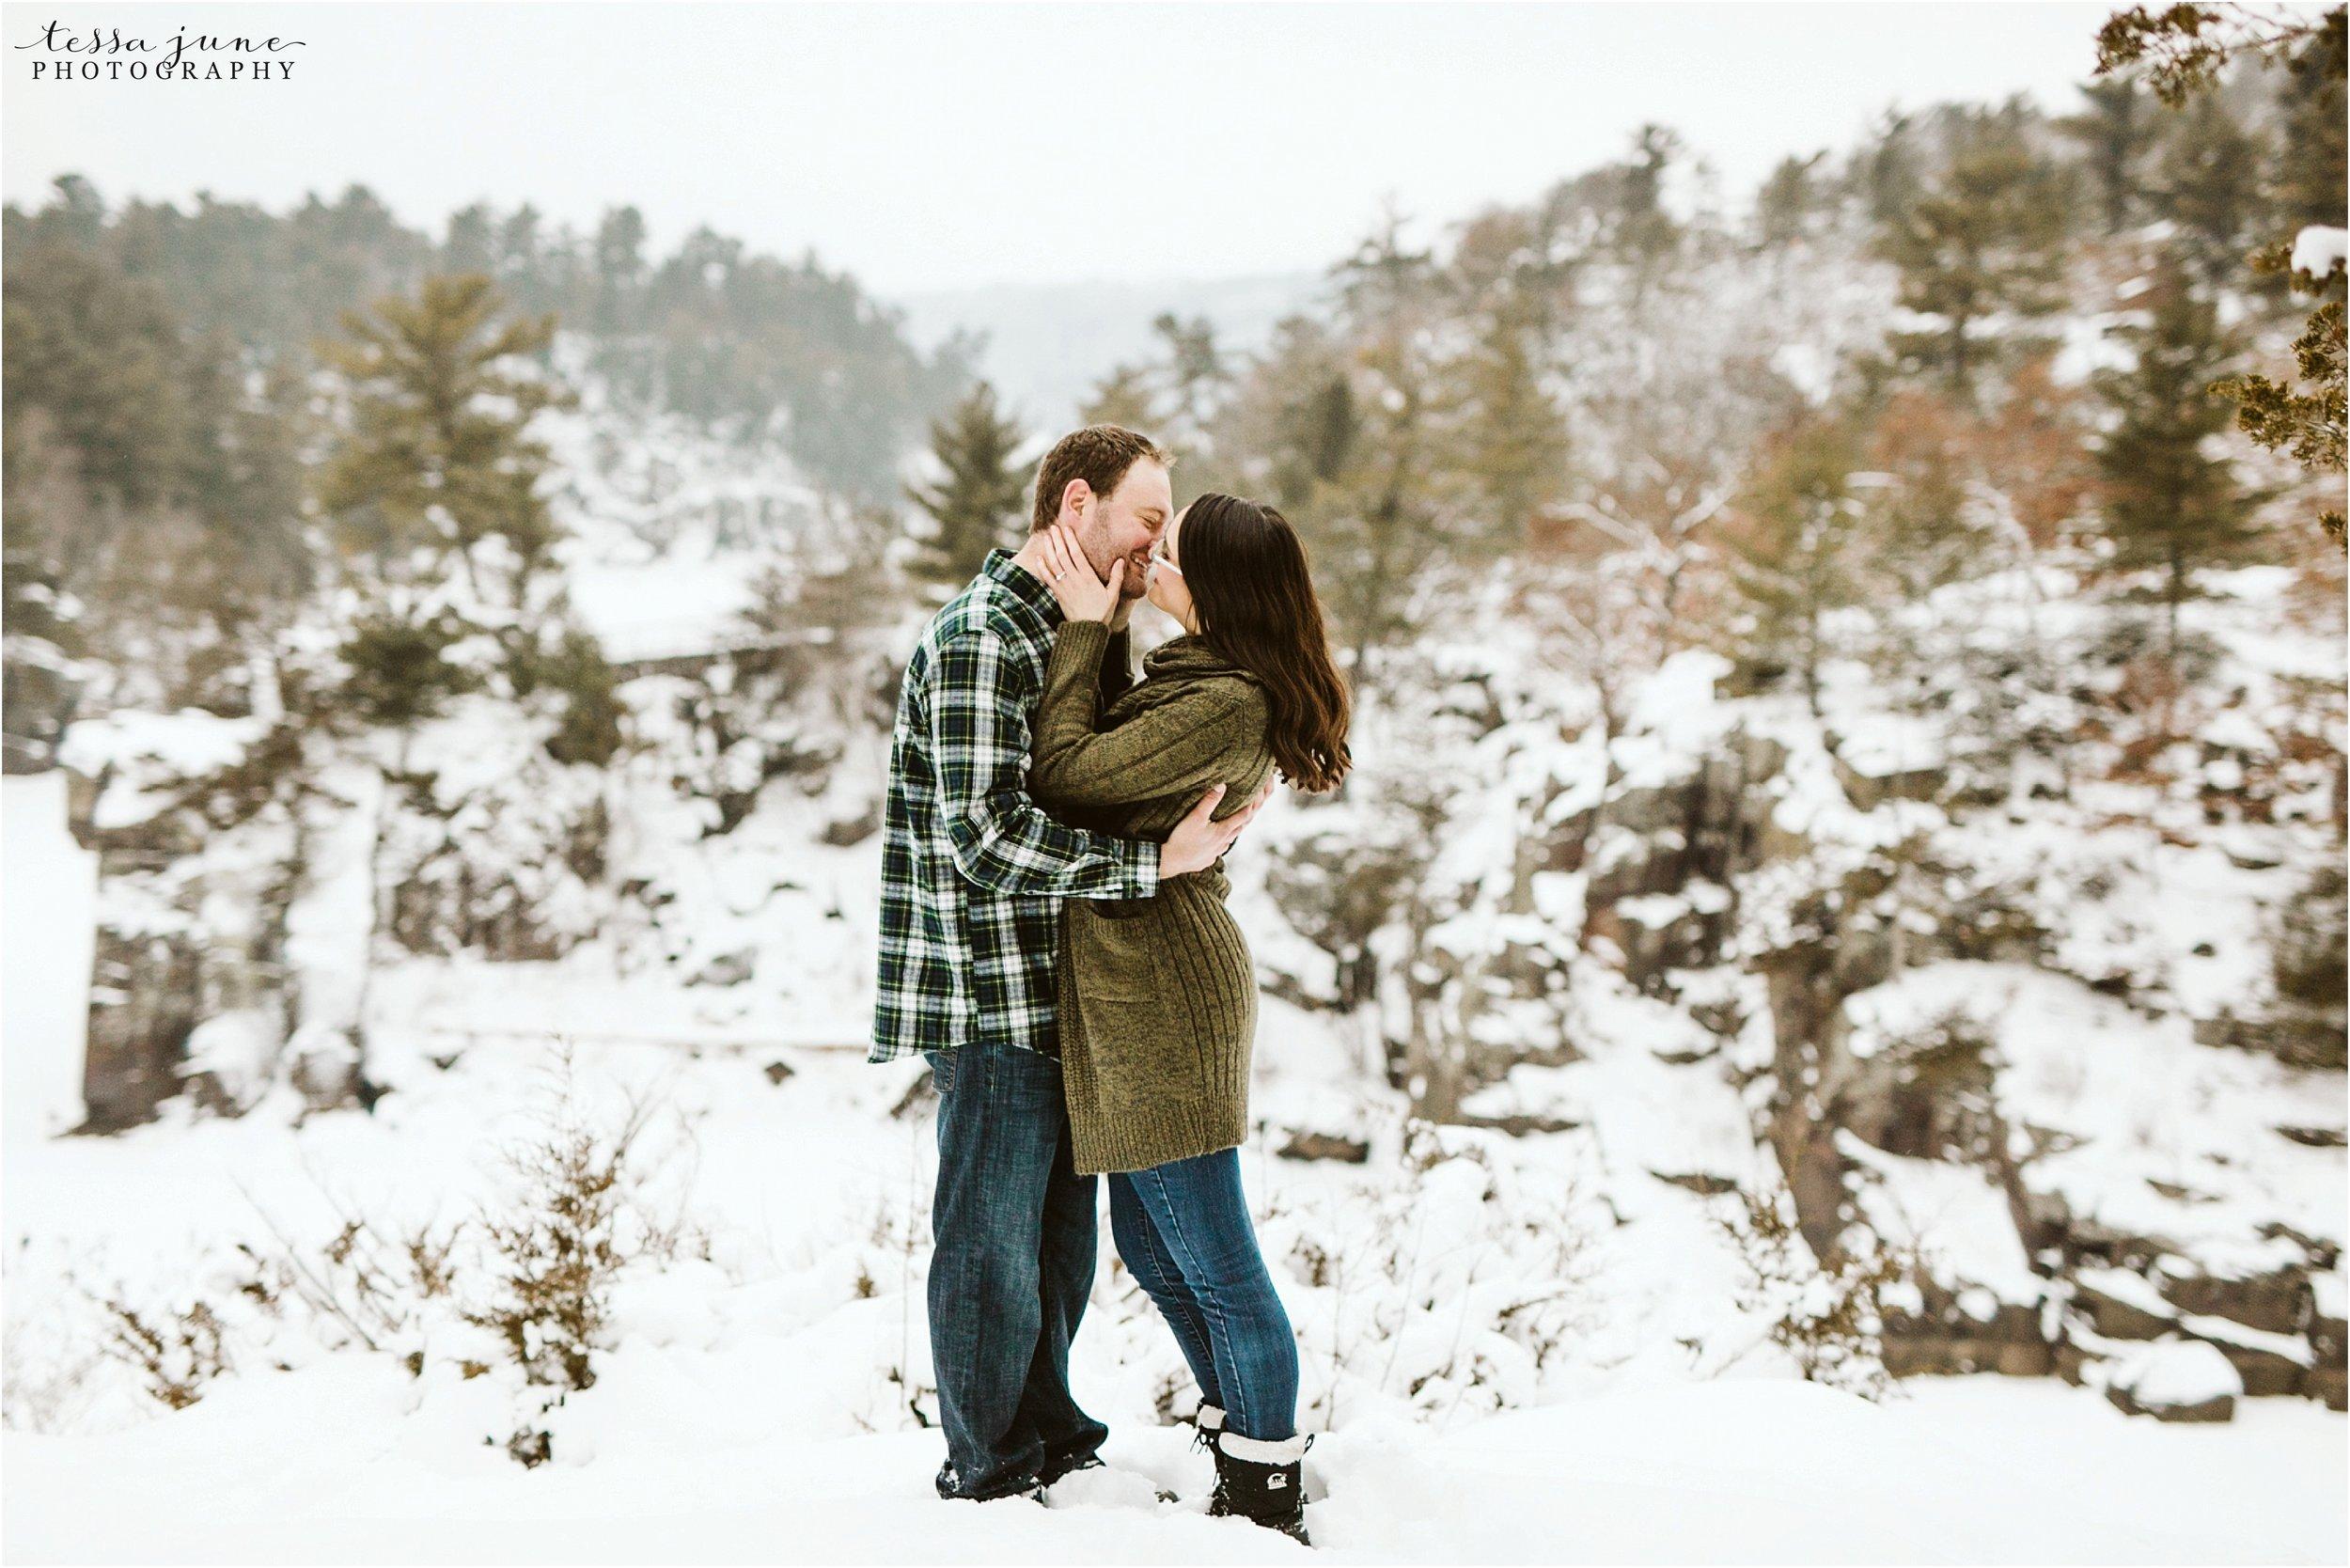 taylors-falls-winter-engagement-session-st-cloud-photographer-31.jpg